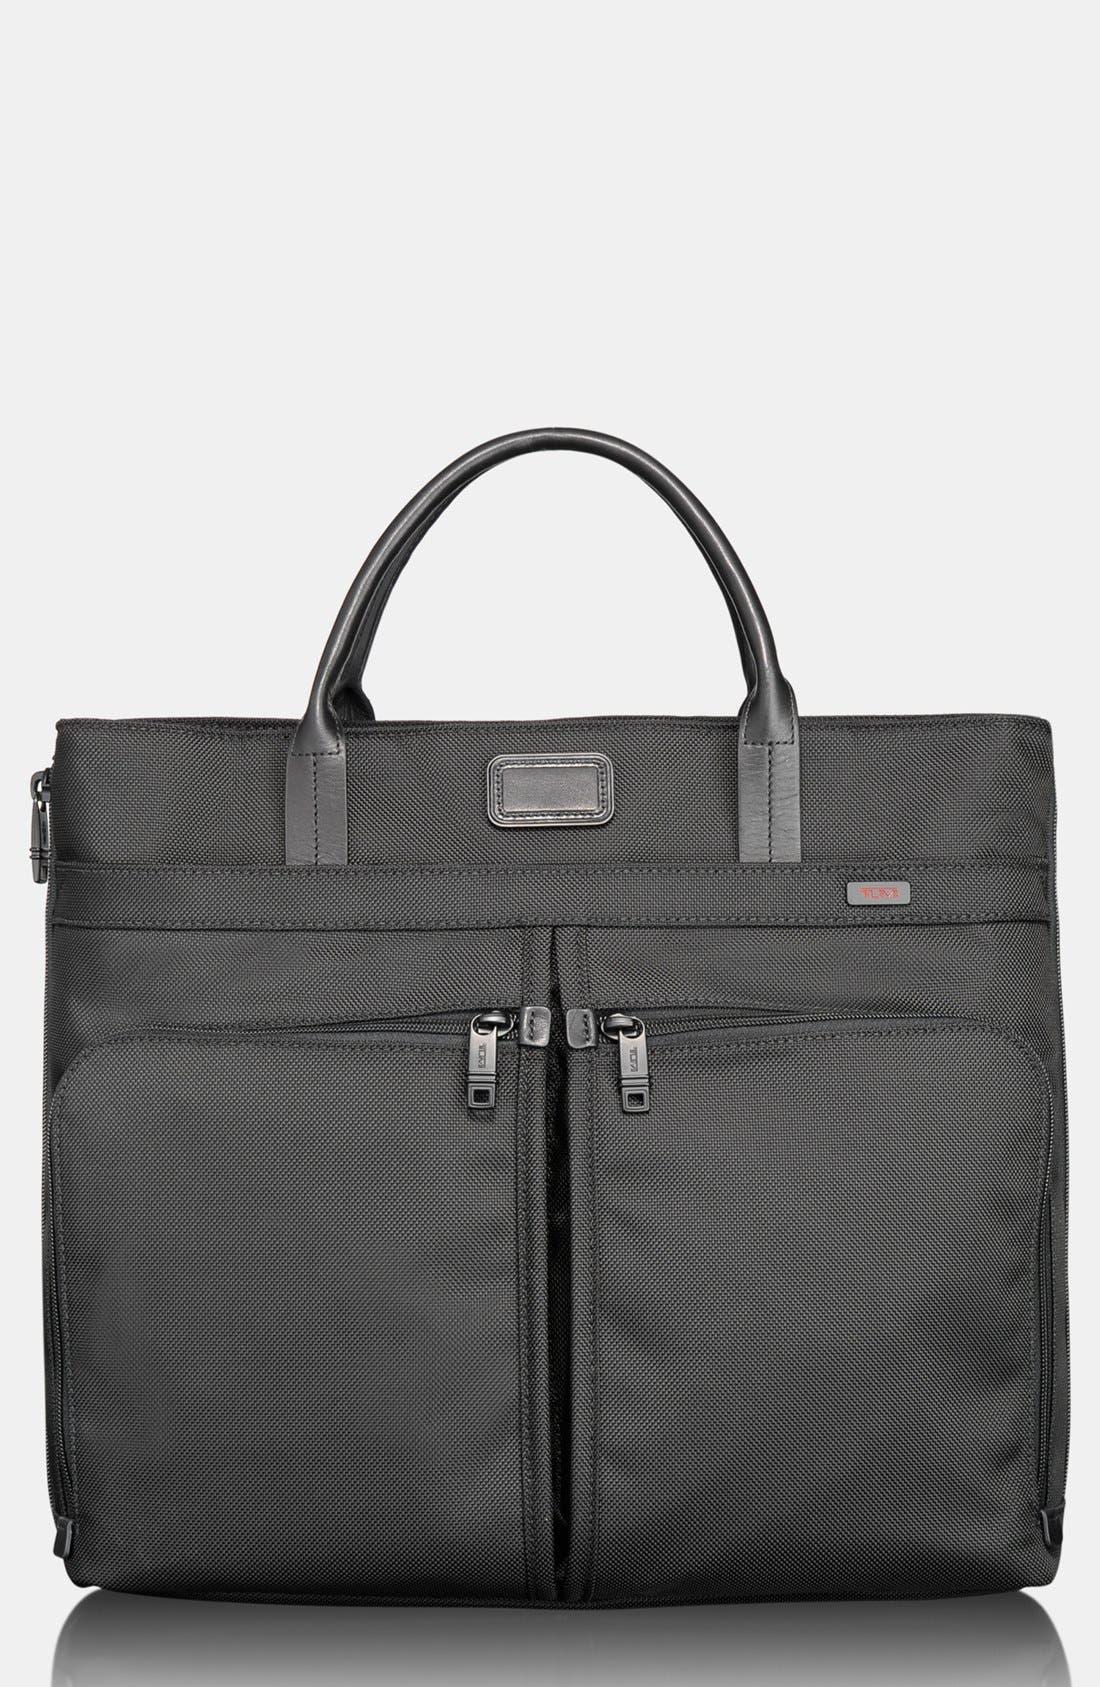 TUMI 'Alpha - Companion' Tote Bag, Main, color, 001